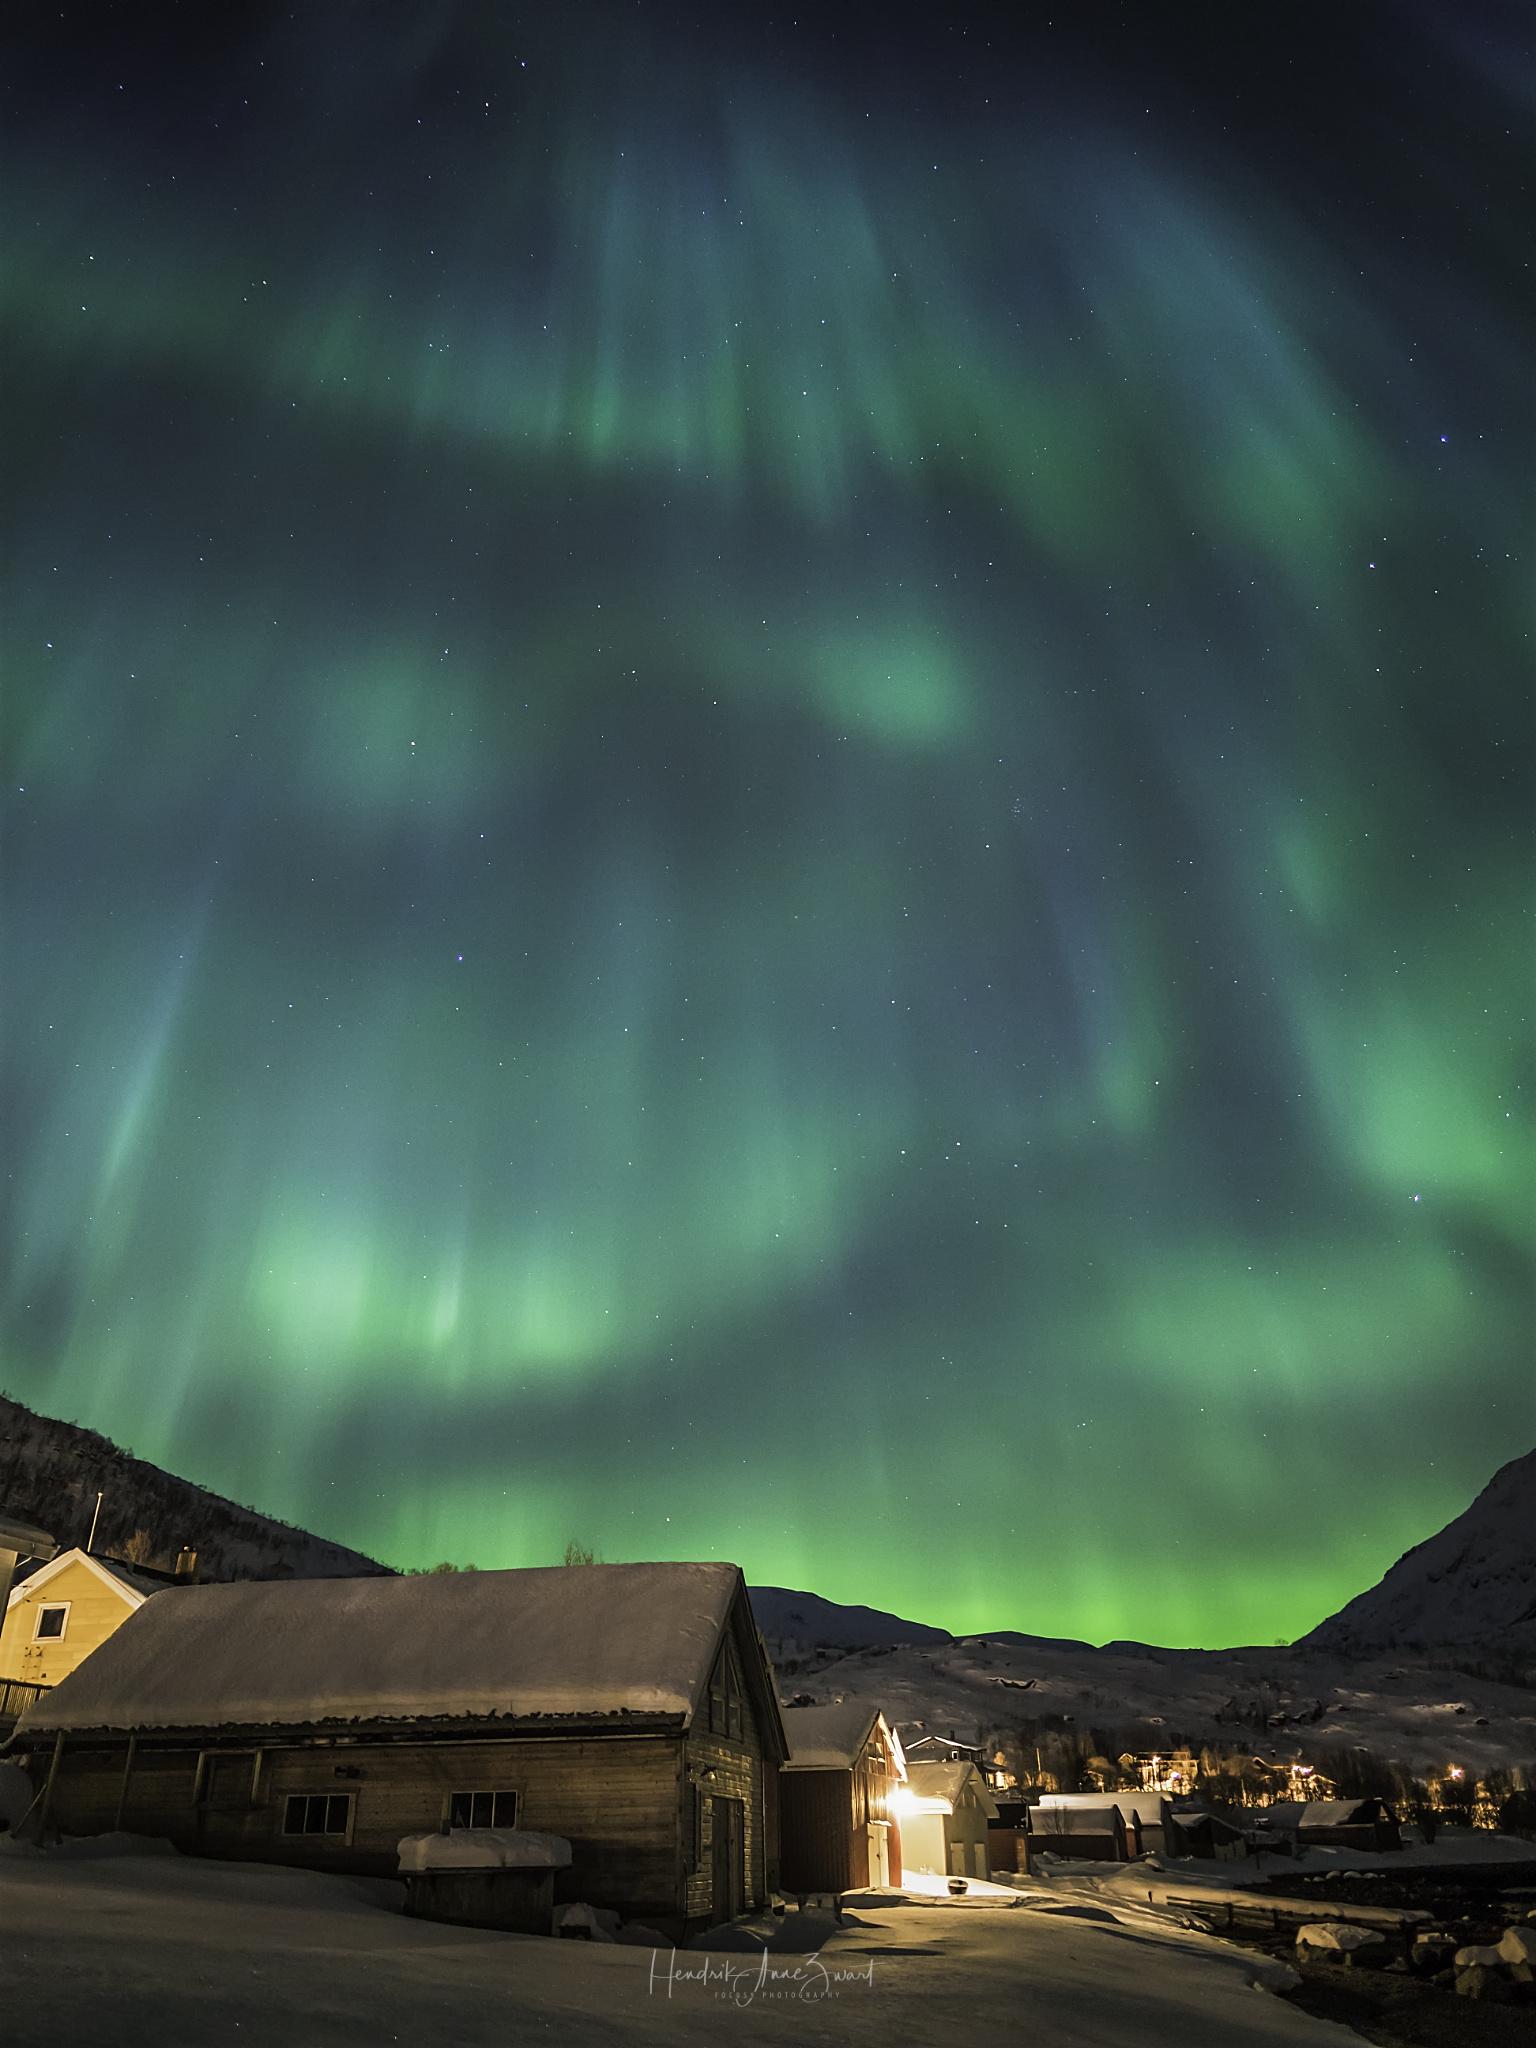 Nordic_Light_Notthern_Lights_Norway_Ersfjordbotn_5.jpg